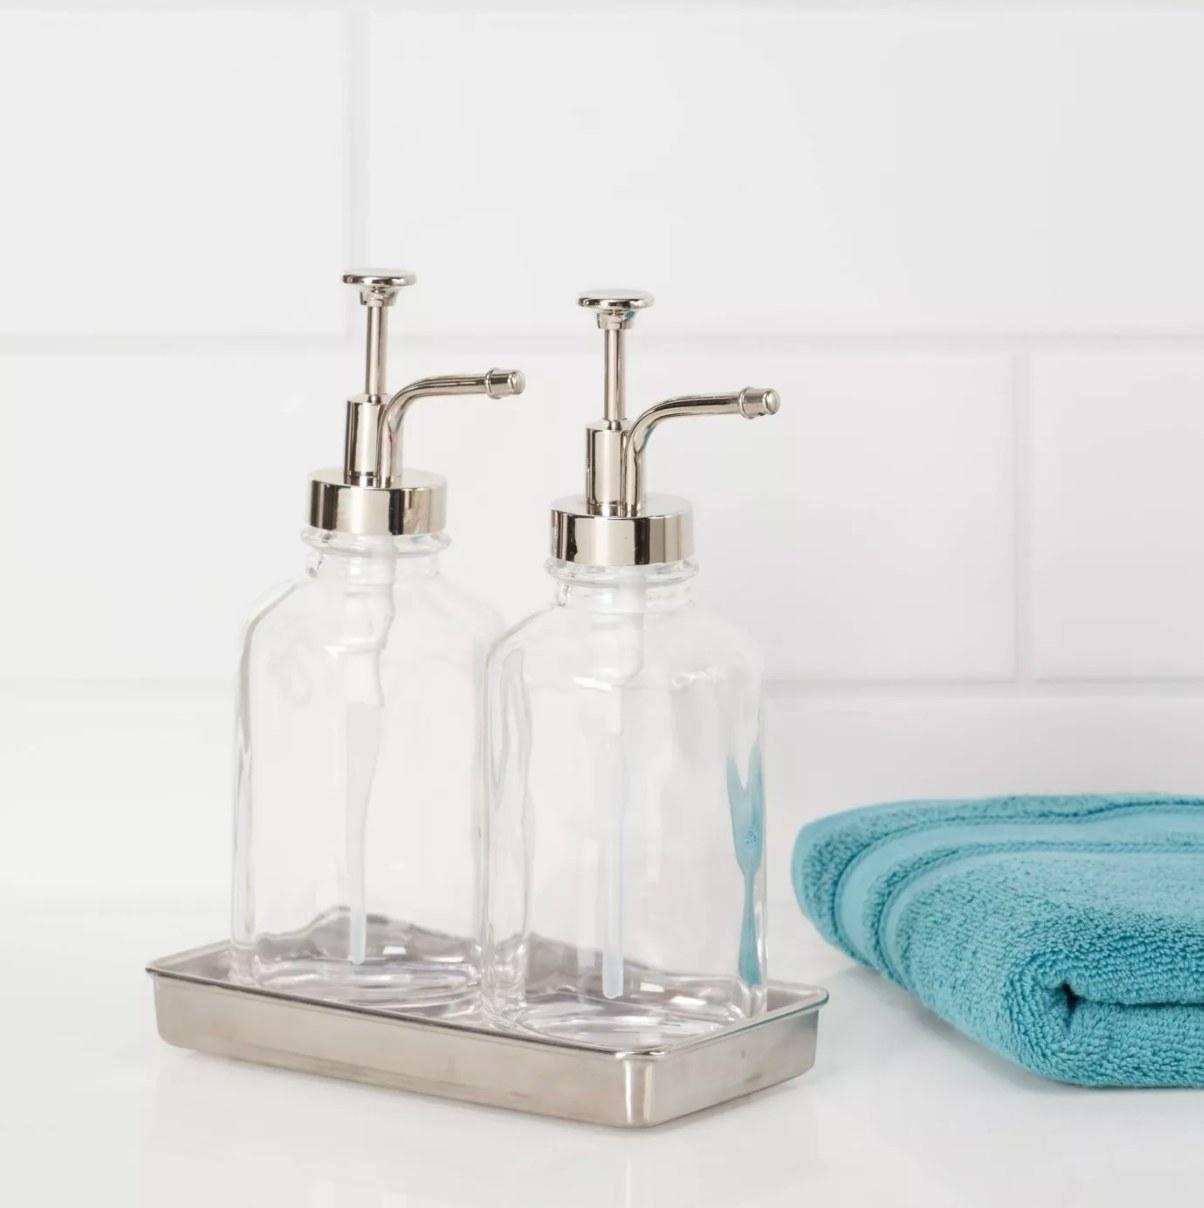 The double soap pump